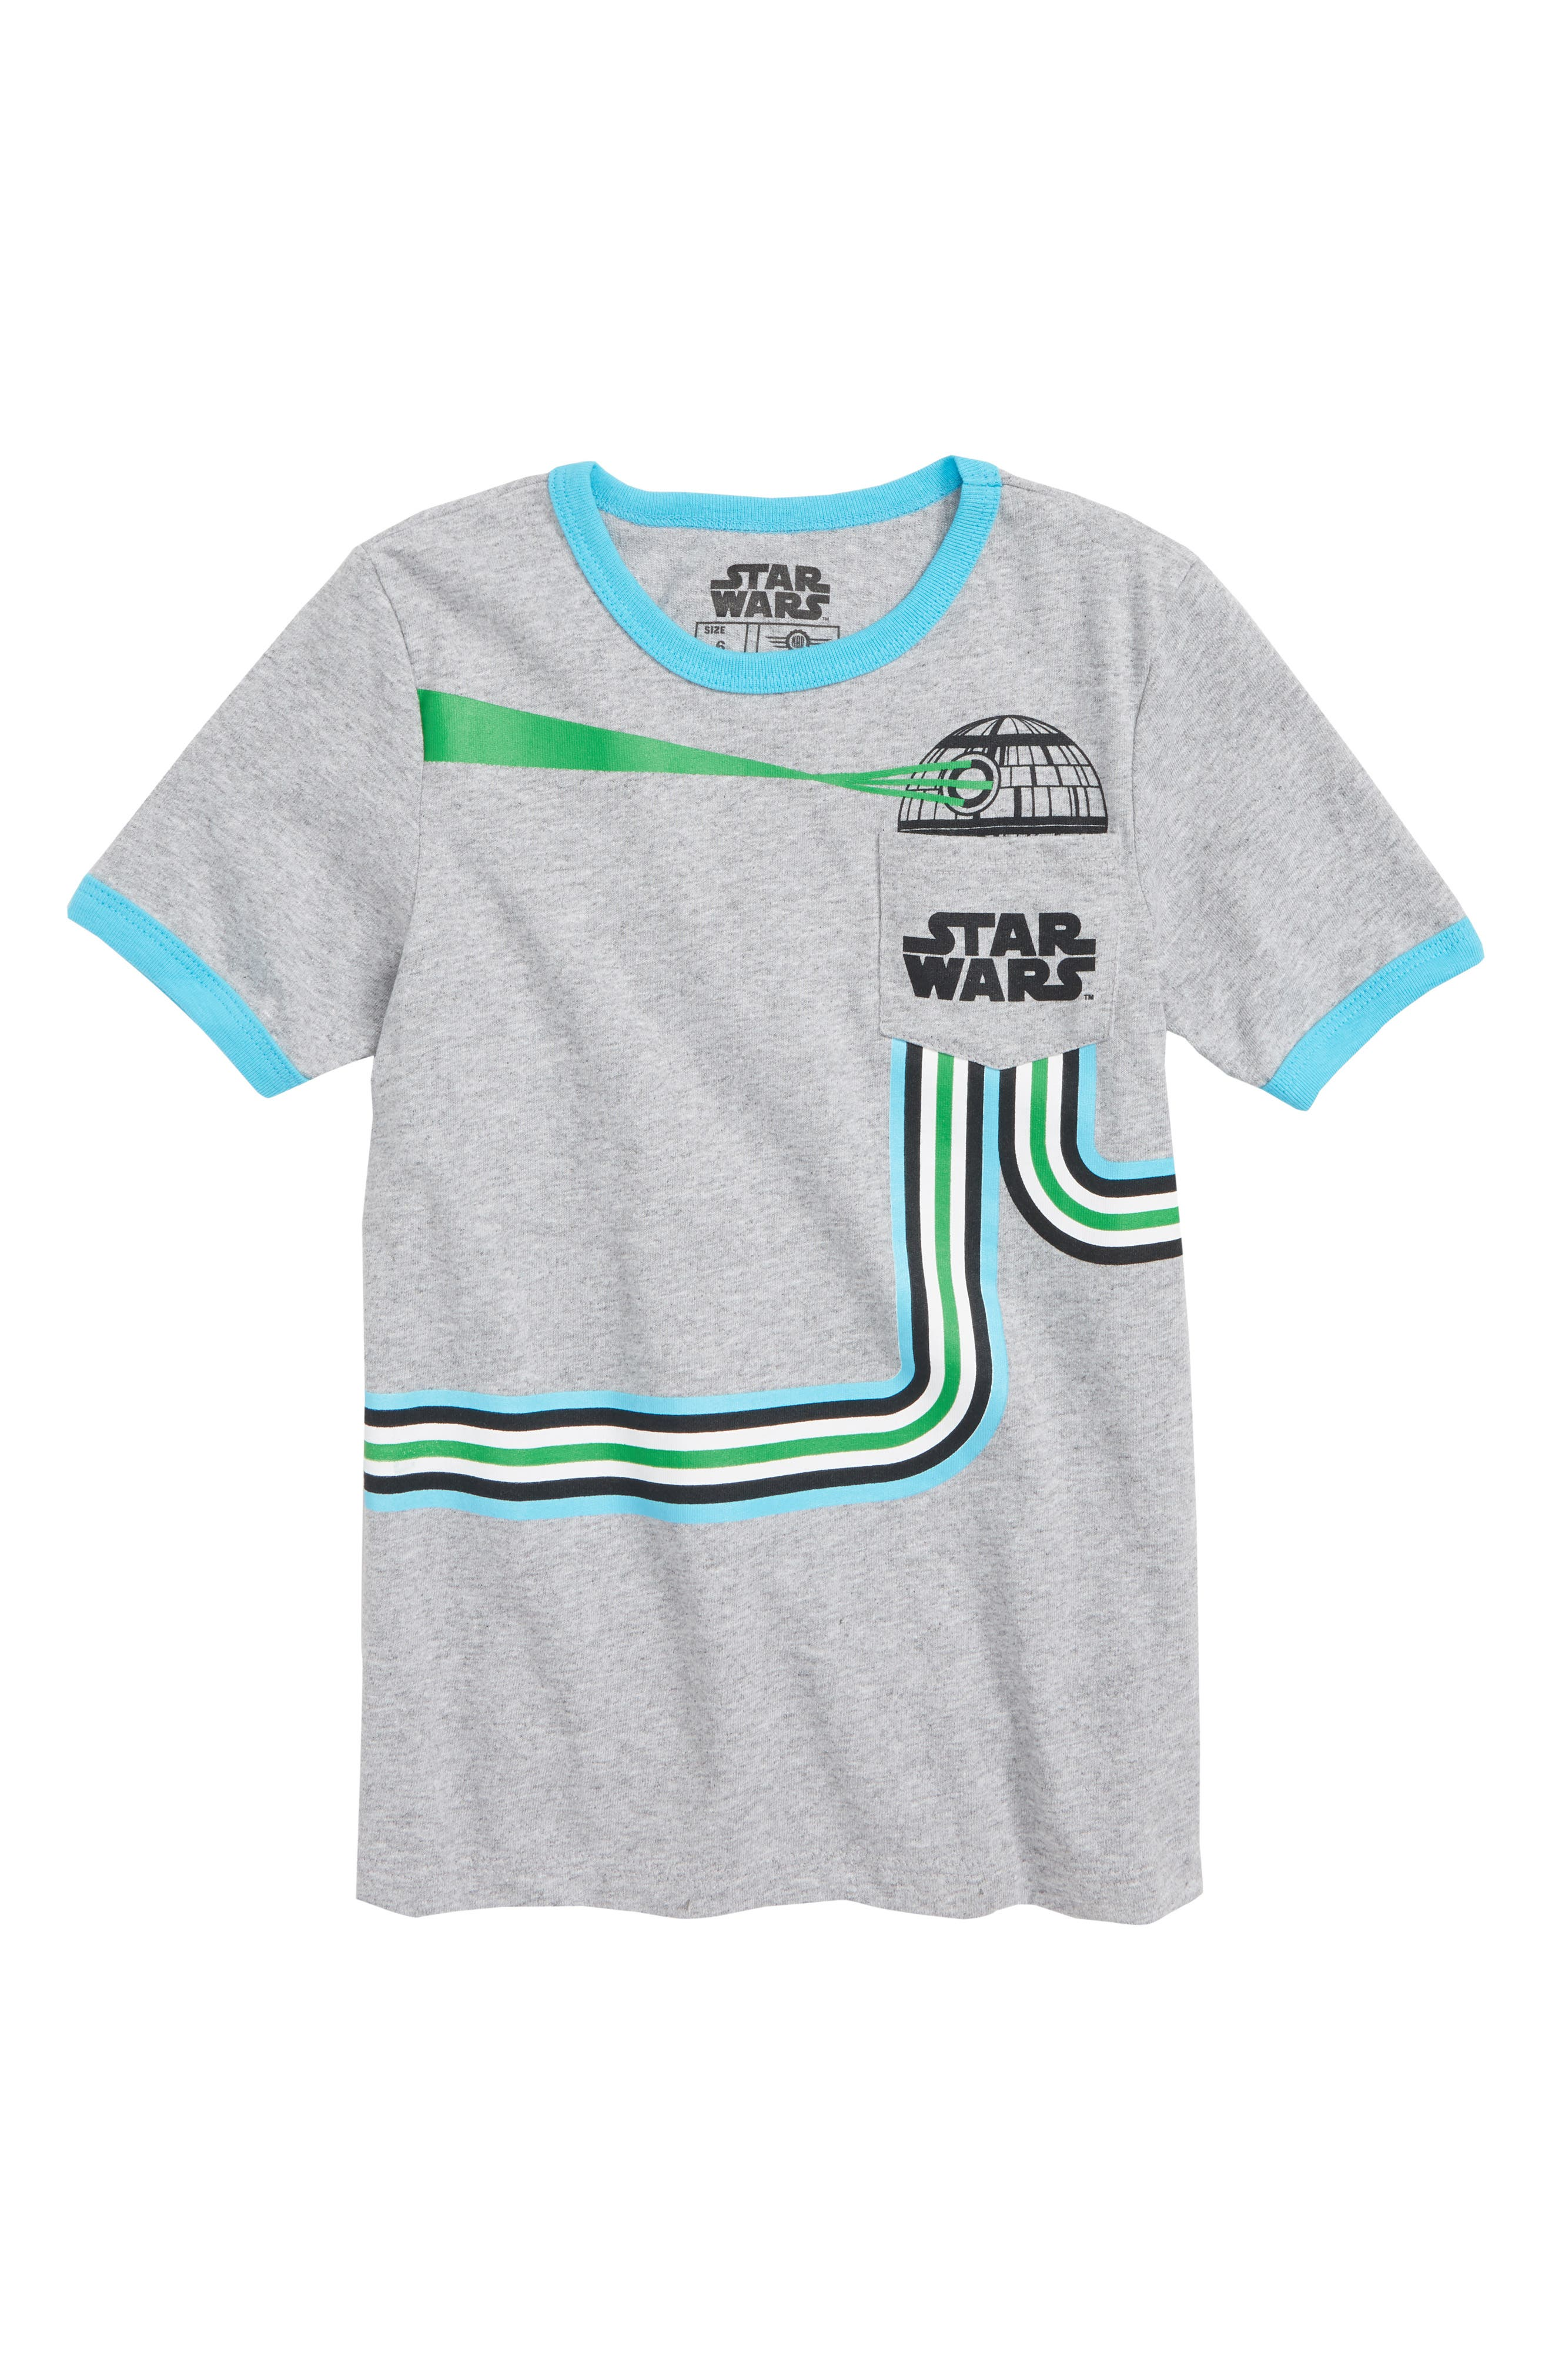 Star Wars Death Star Pocket T-Shirt,                         Main,                         color, HEATHER GREY/ LIGHT BLUE